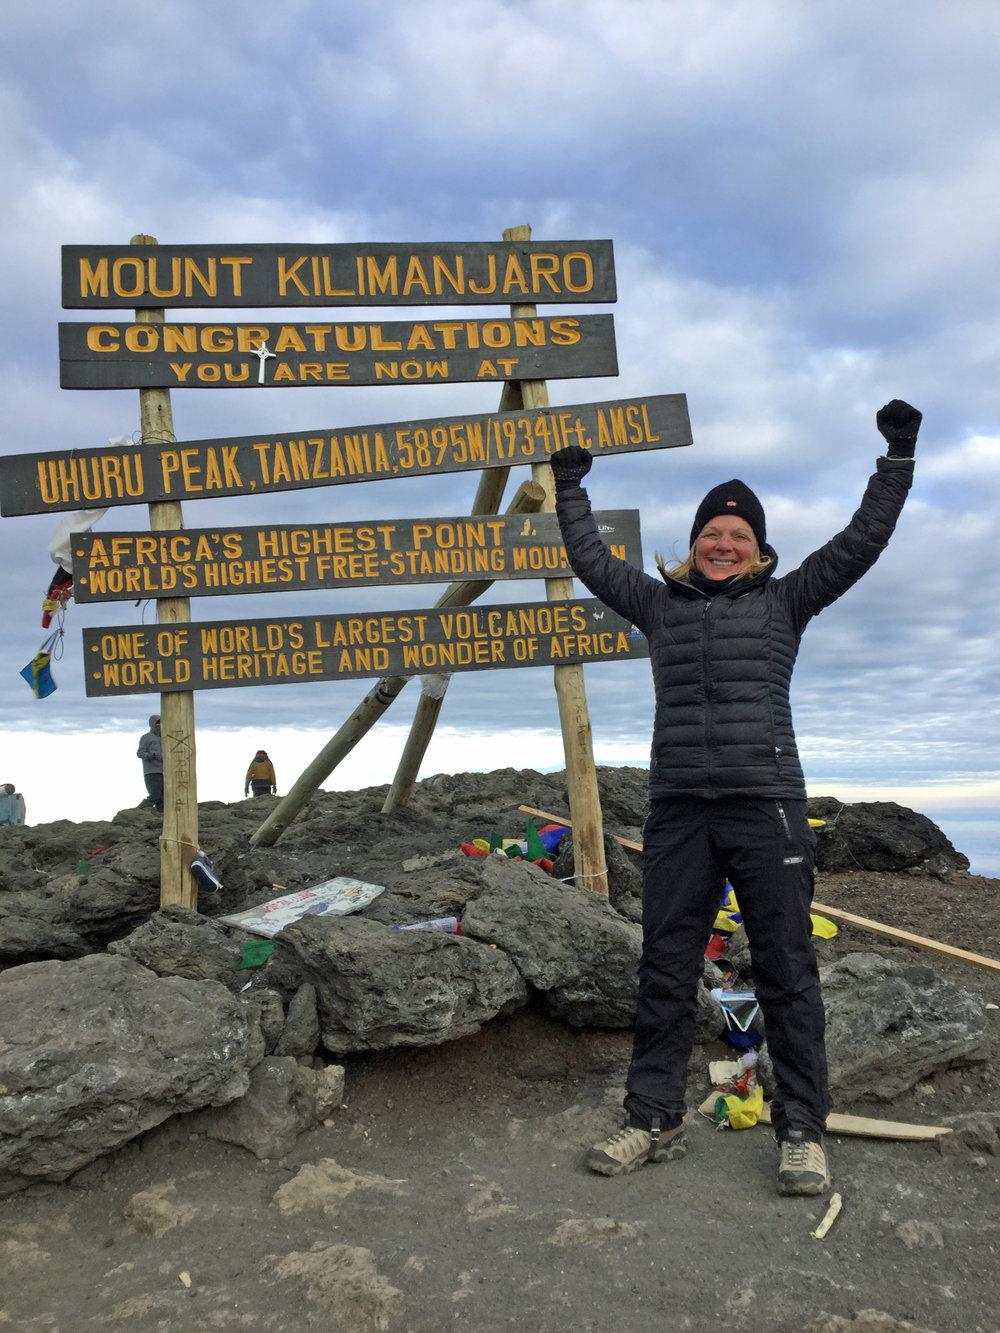 After my divorce, I conquered Mt Kilimanjaro!